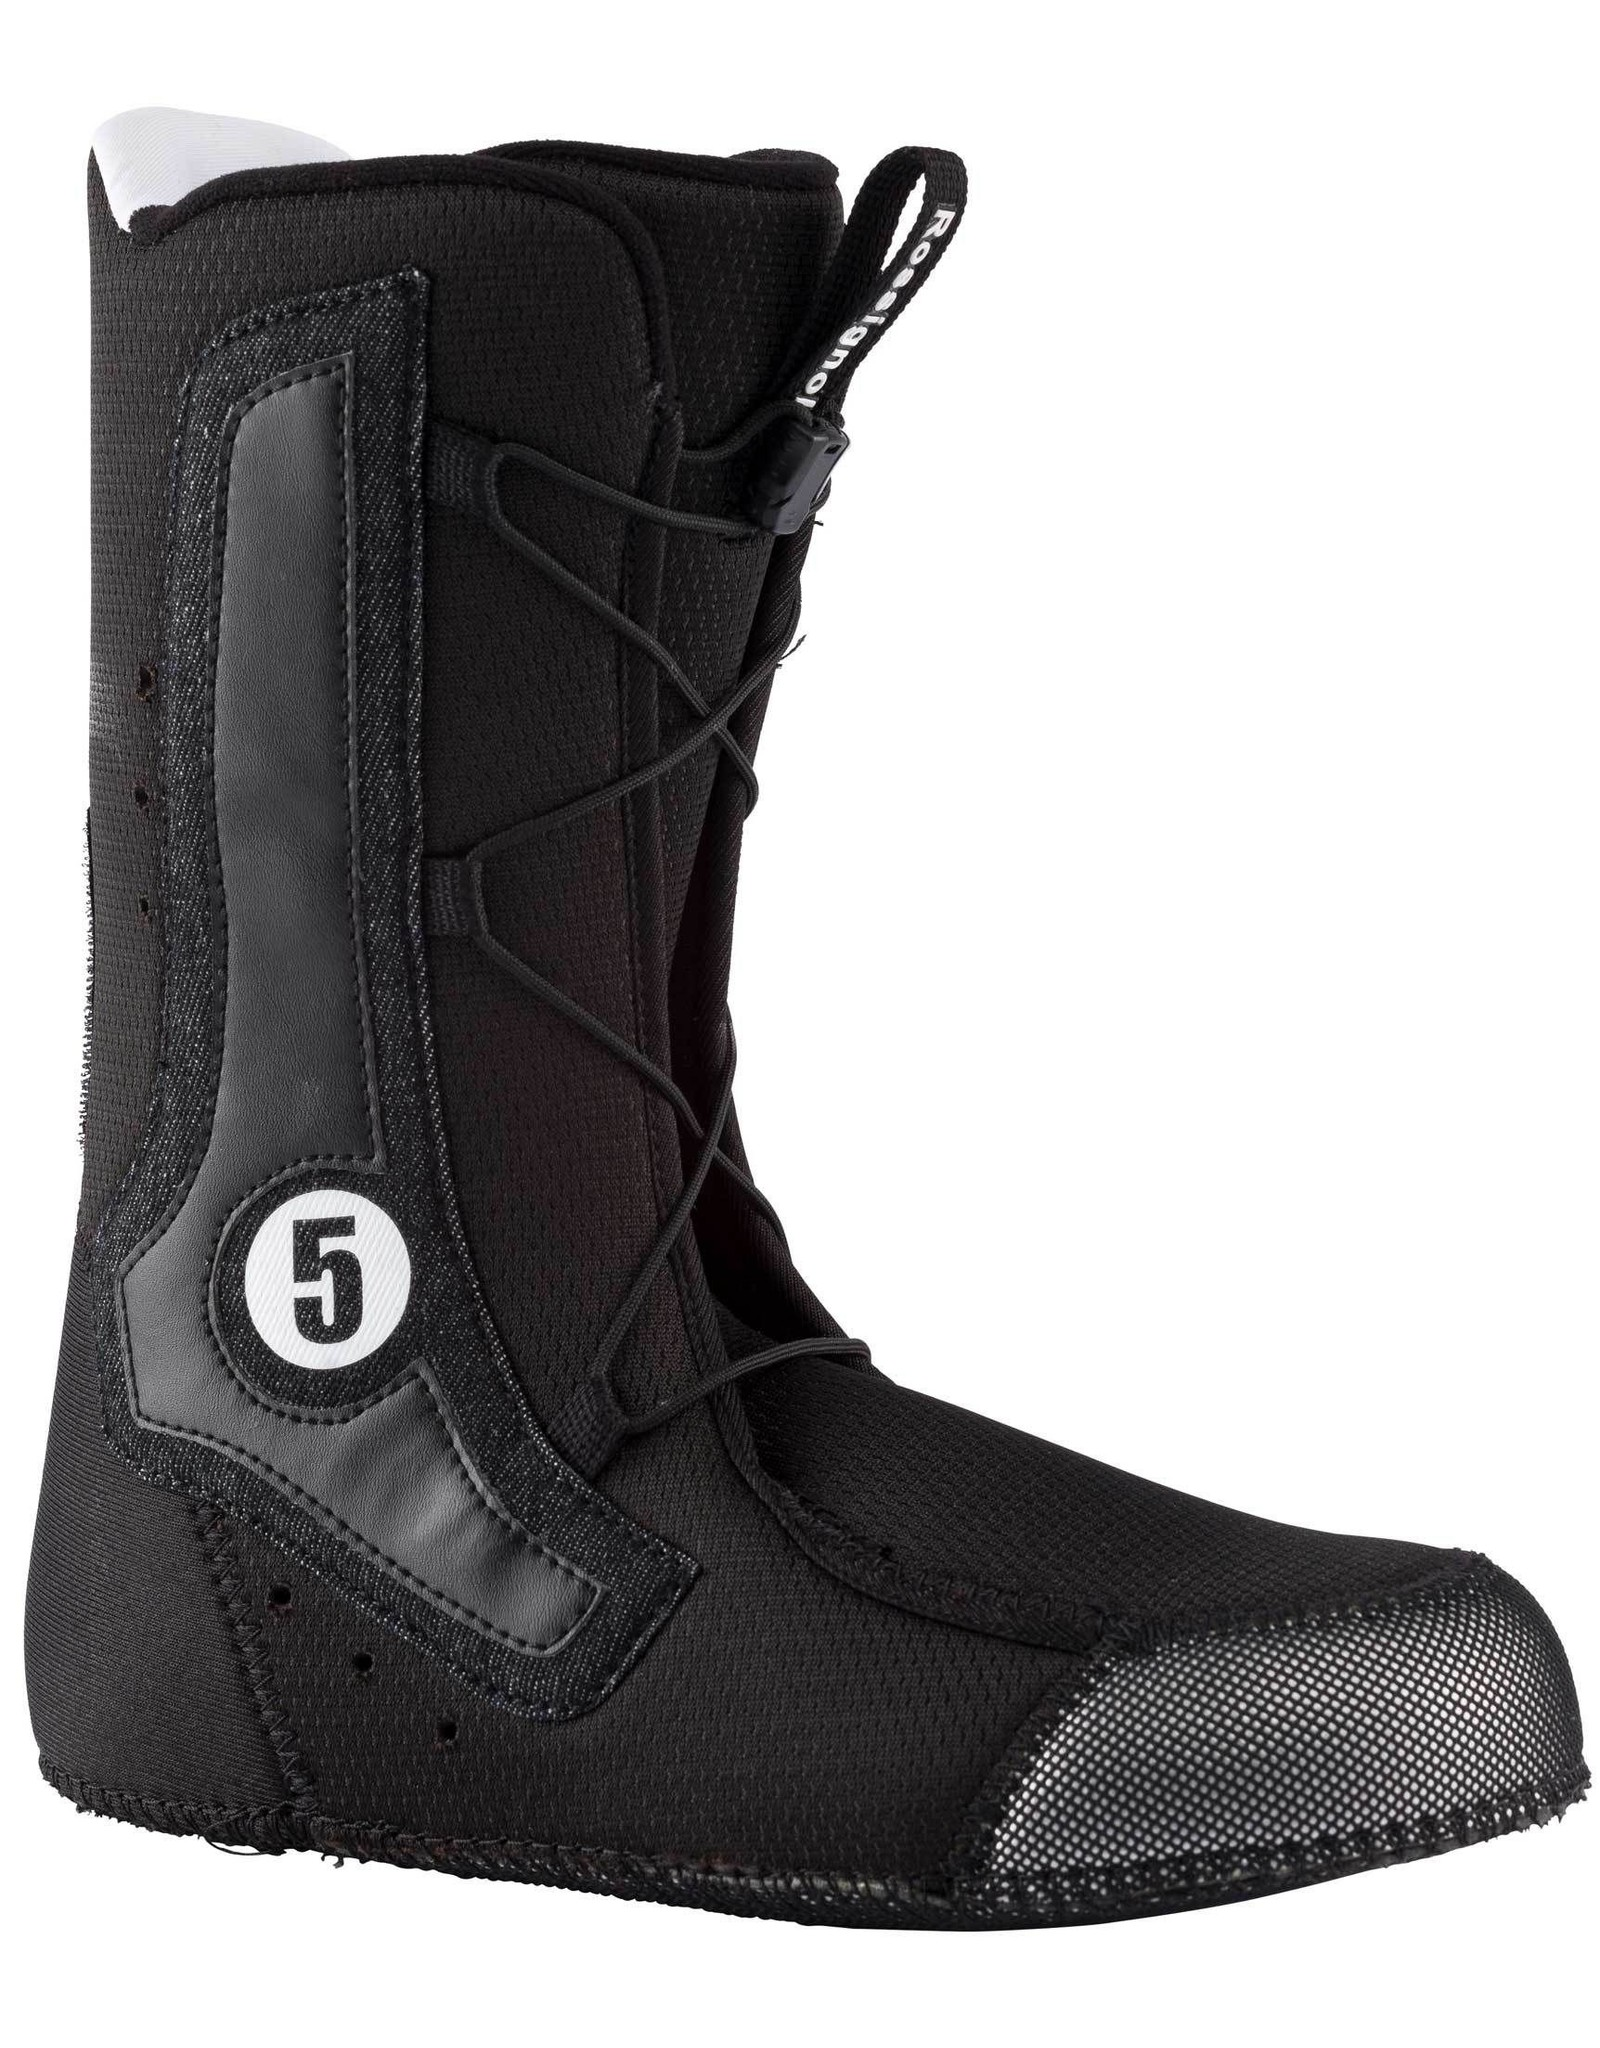 ROSSIGNOL ROSSIGNOL ALLEY BOA H3 WOMEN SNOWBOARD BOOT SR 20